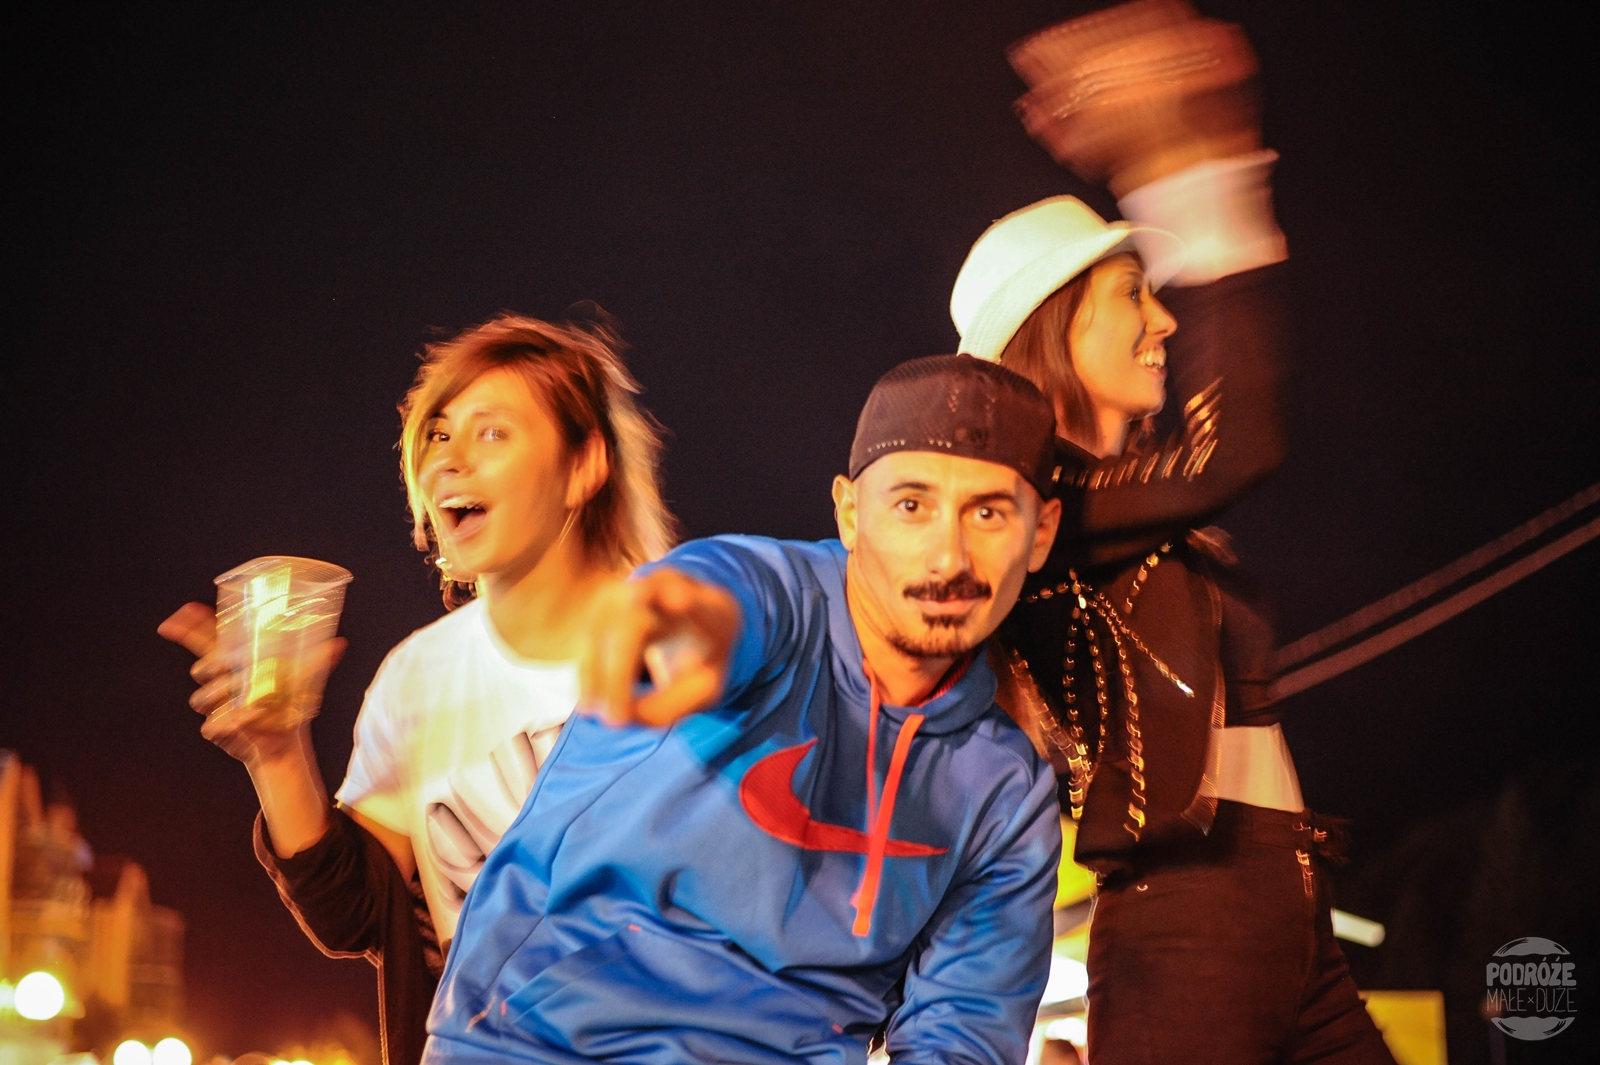 Serbia festiwal trąb w Guca impreza